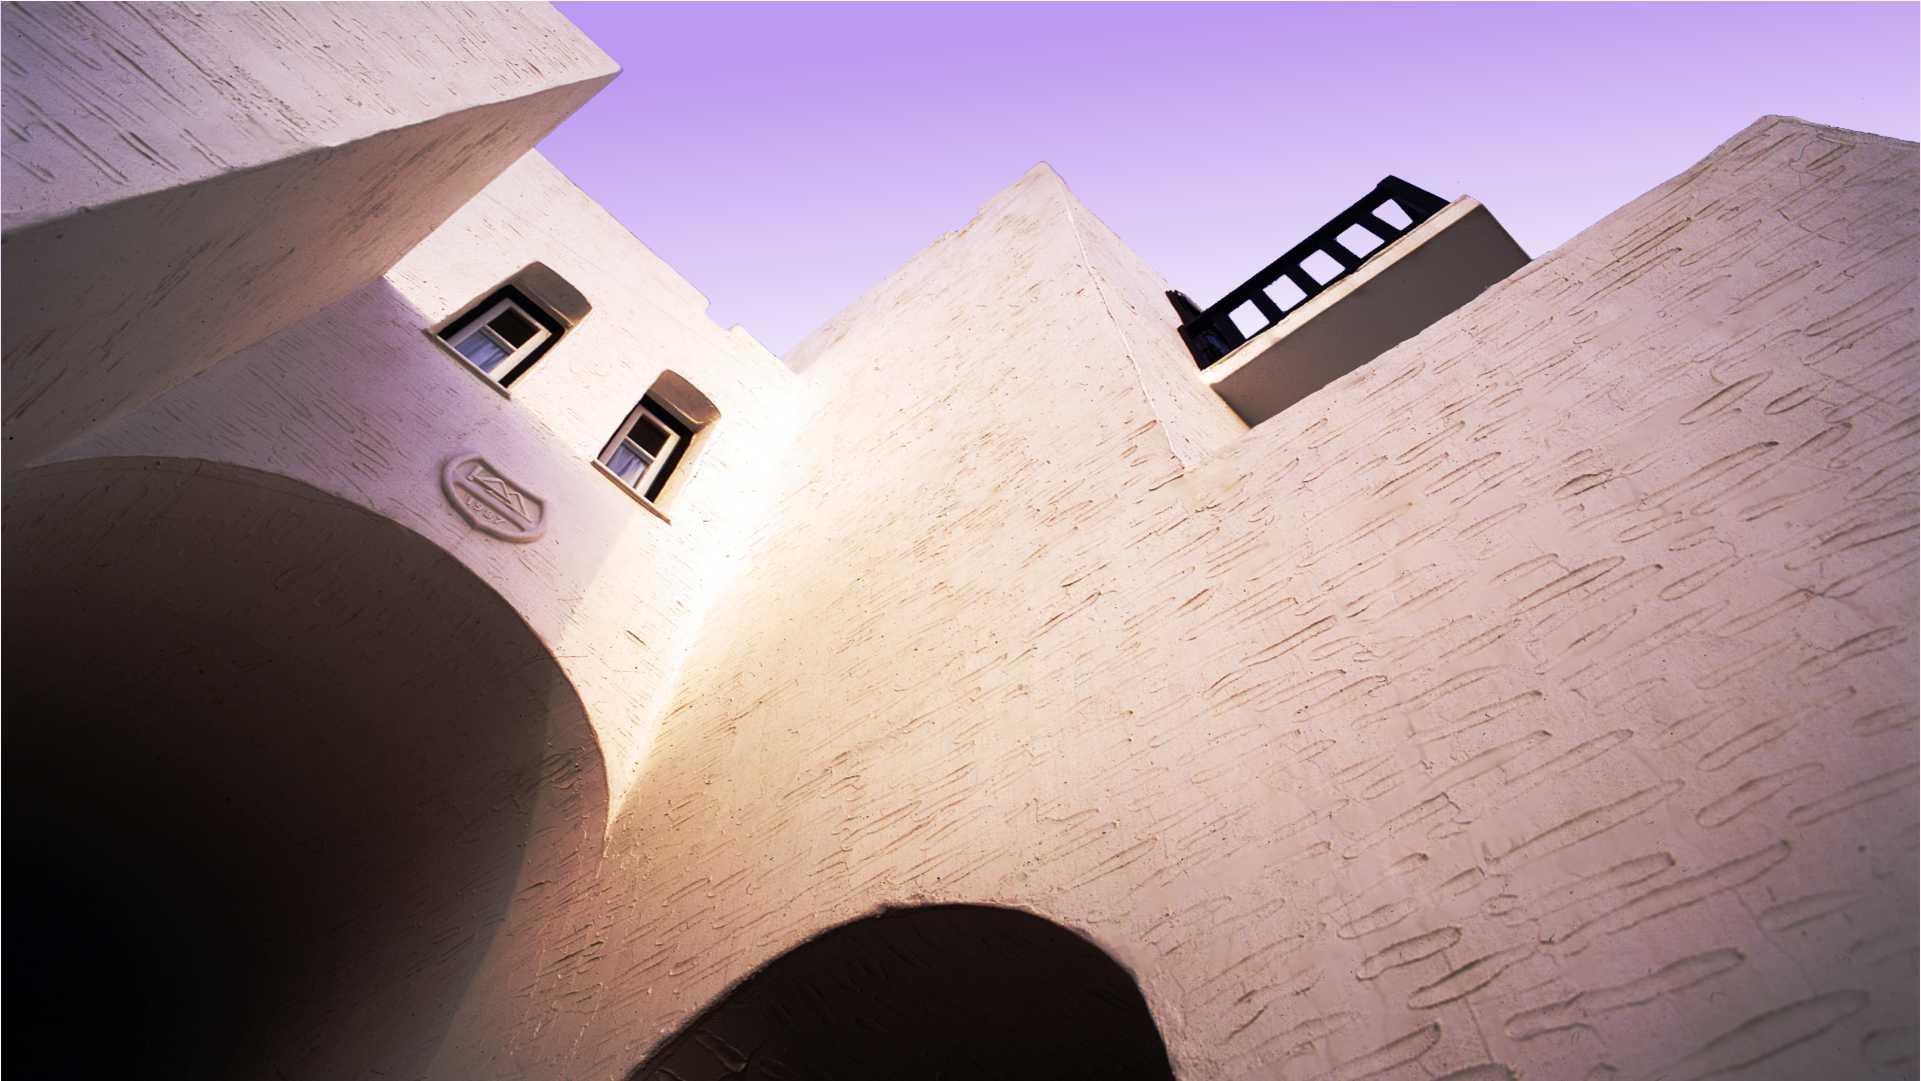 Antirides boutique hotel-paros island_Architecture_3